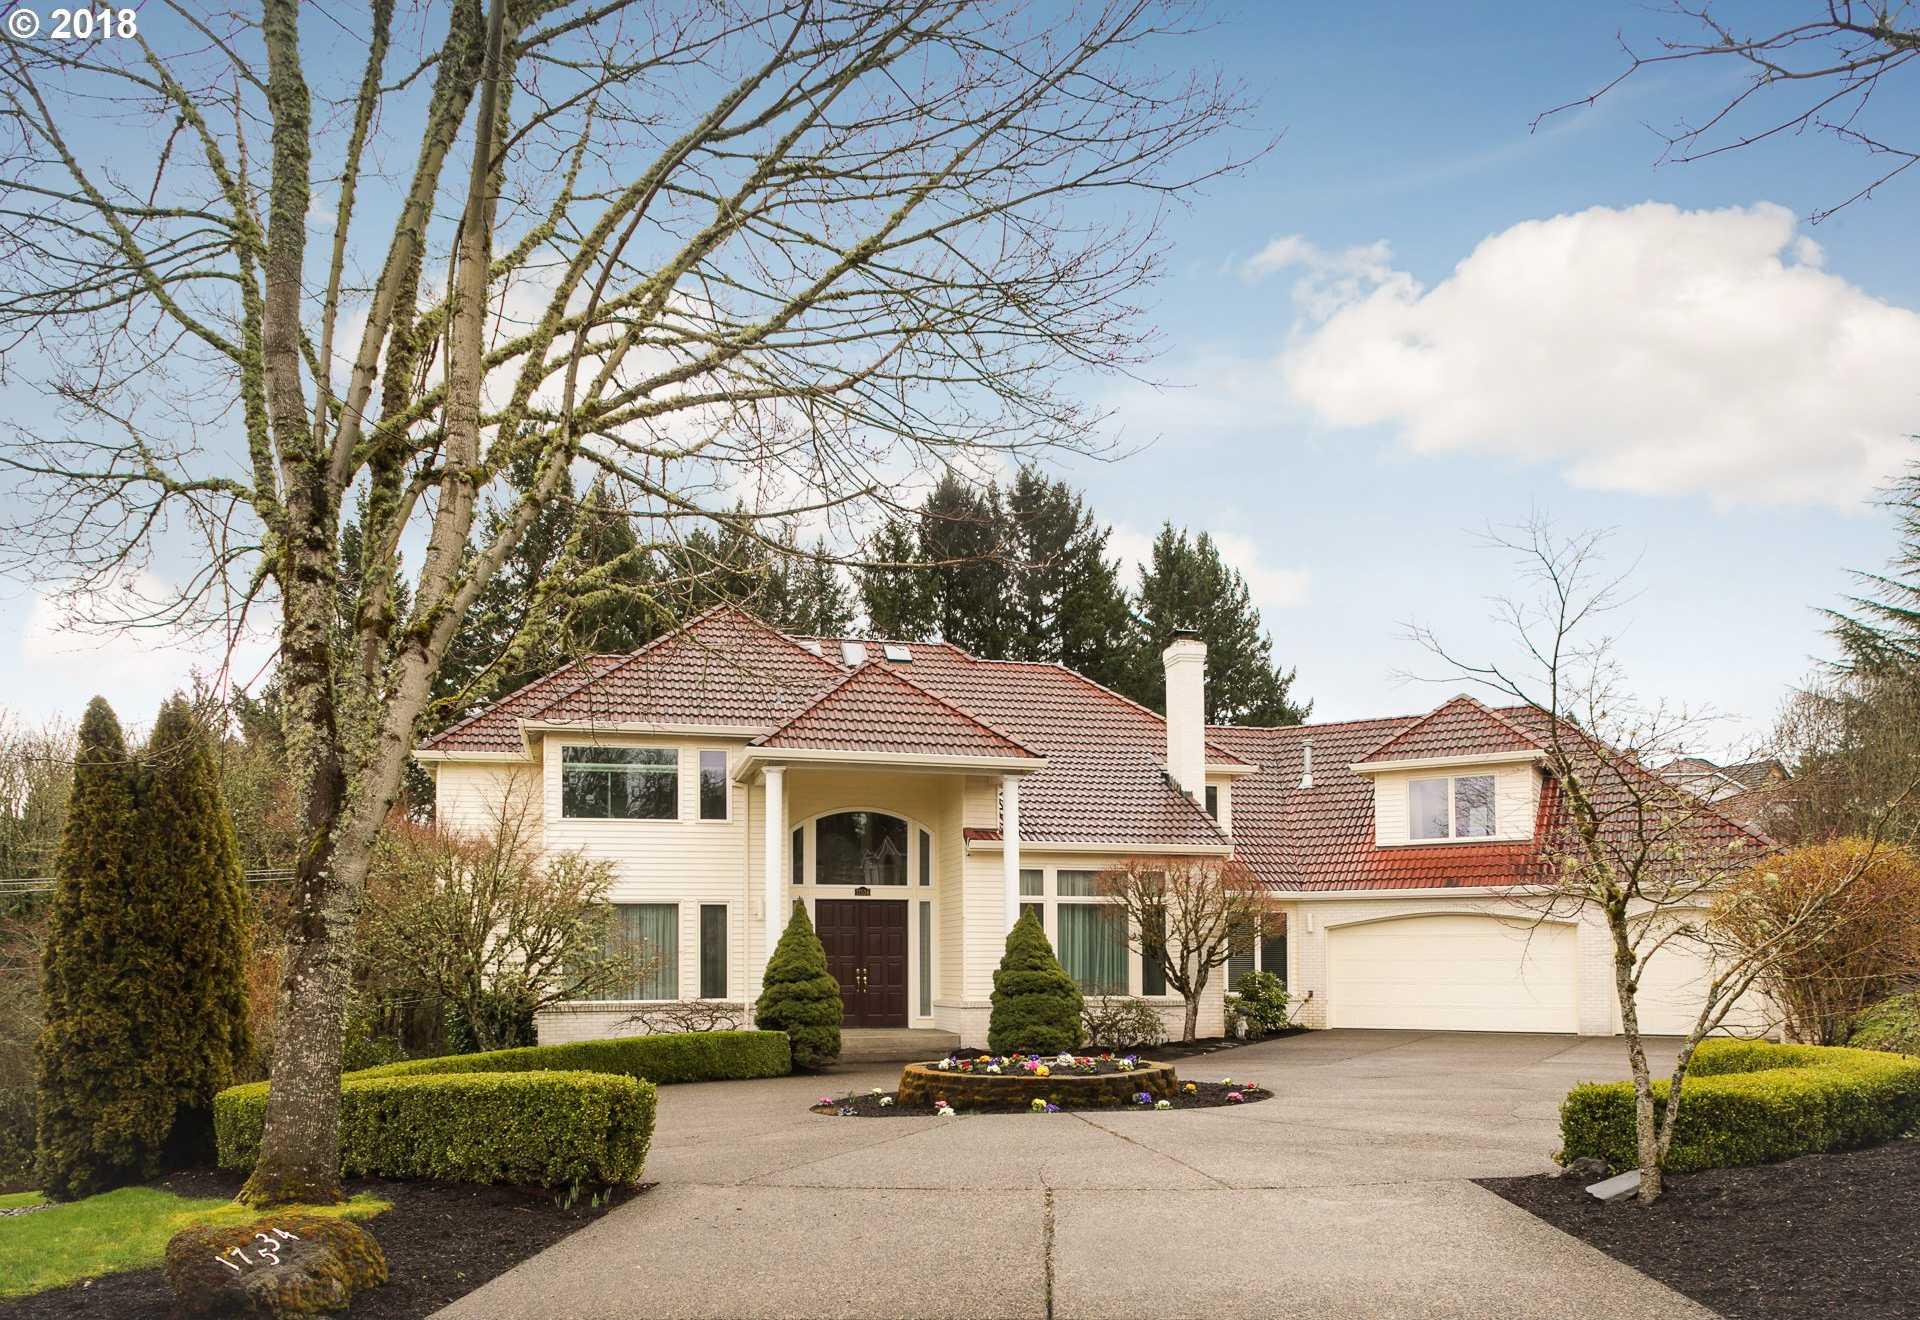 $675,000 - 5Br/3Ba -  for Sale in Kemmer View Estates, Beaverton